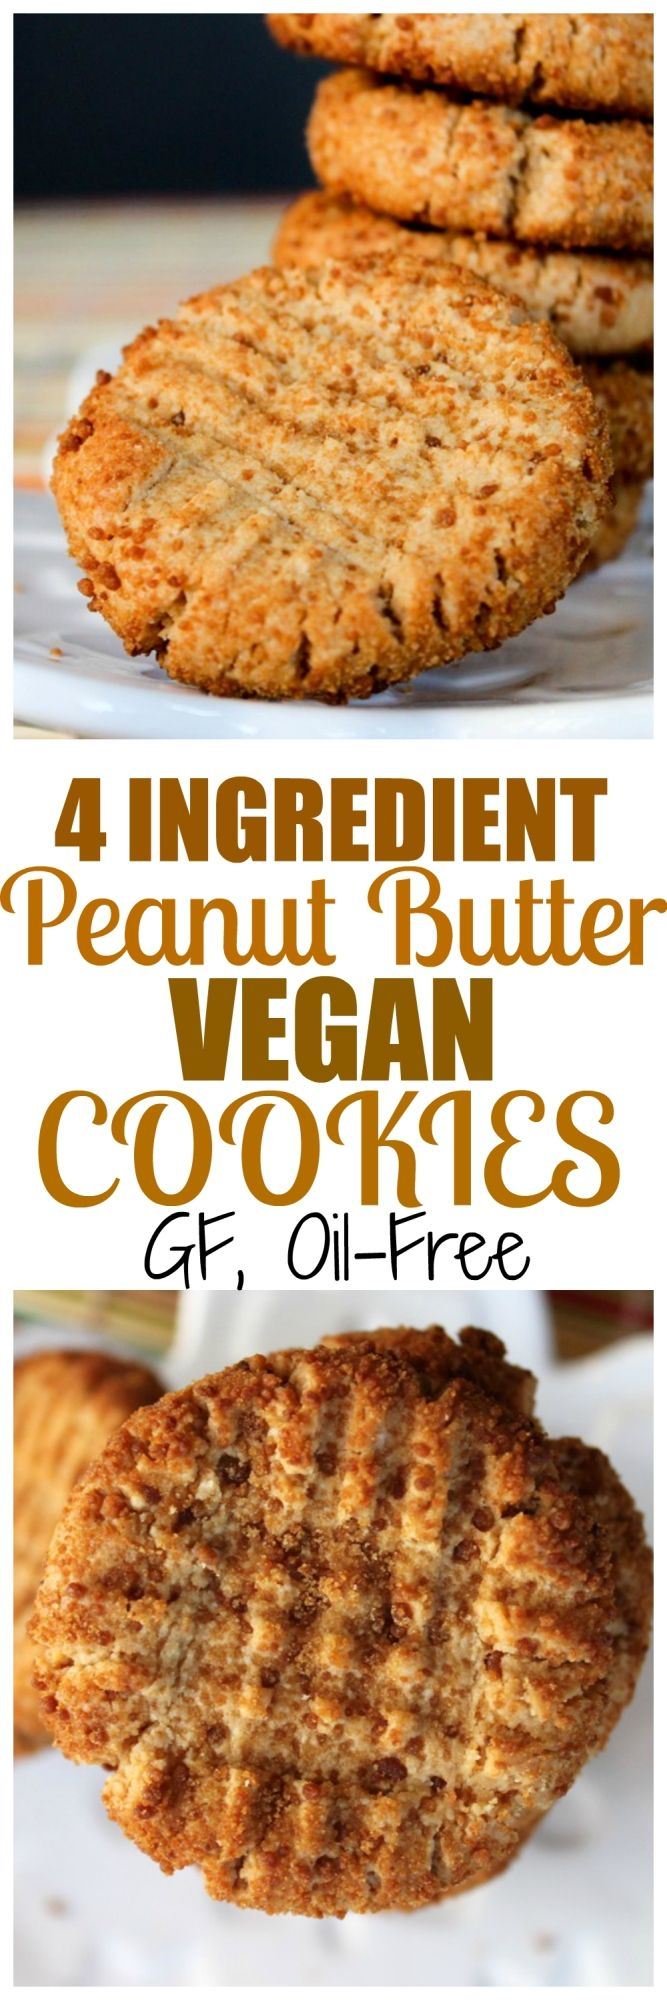 4 INGREDIENT PEANUT BUTTER COOKIES! Vegan, gluten-free and oil-free. #cookies #vegan #glutenfree #oilfree #peanutbutter